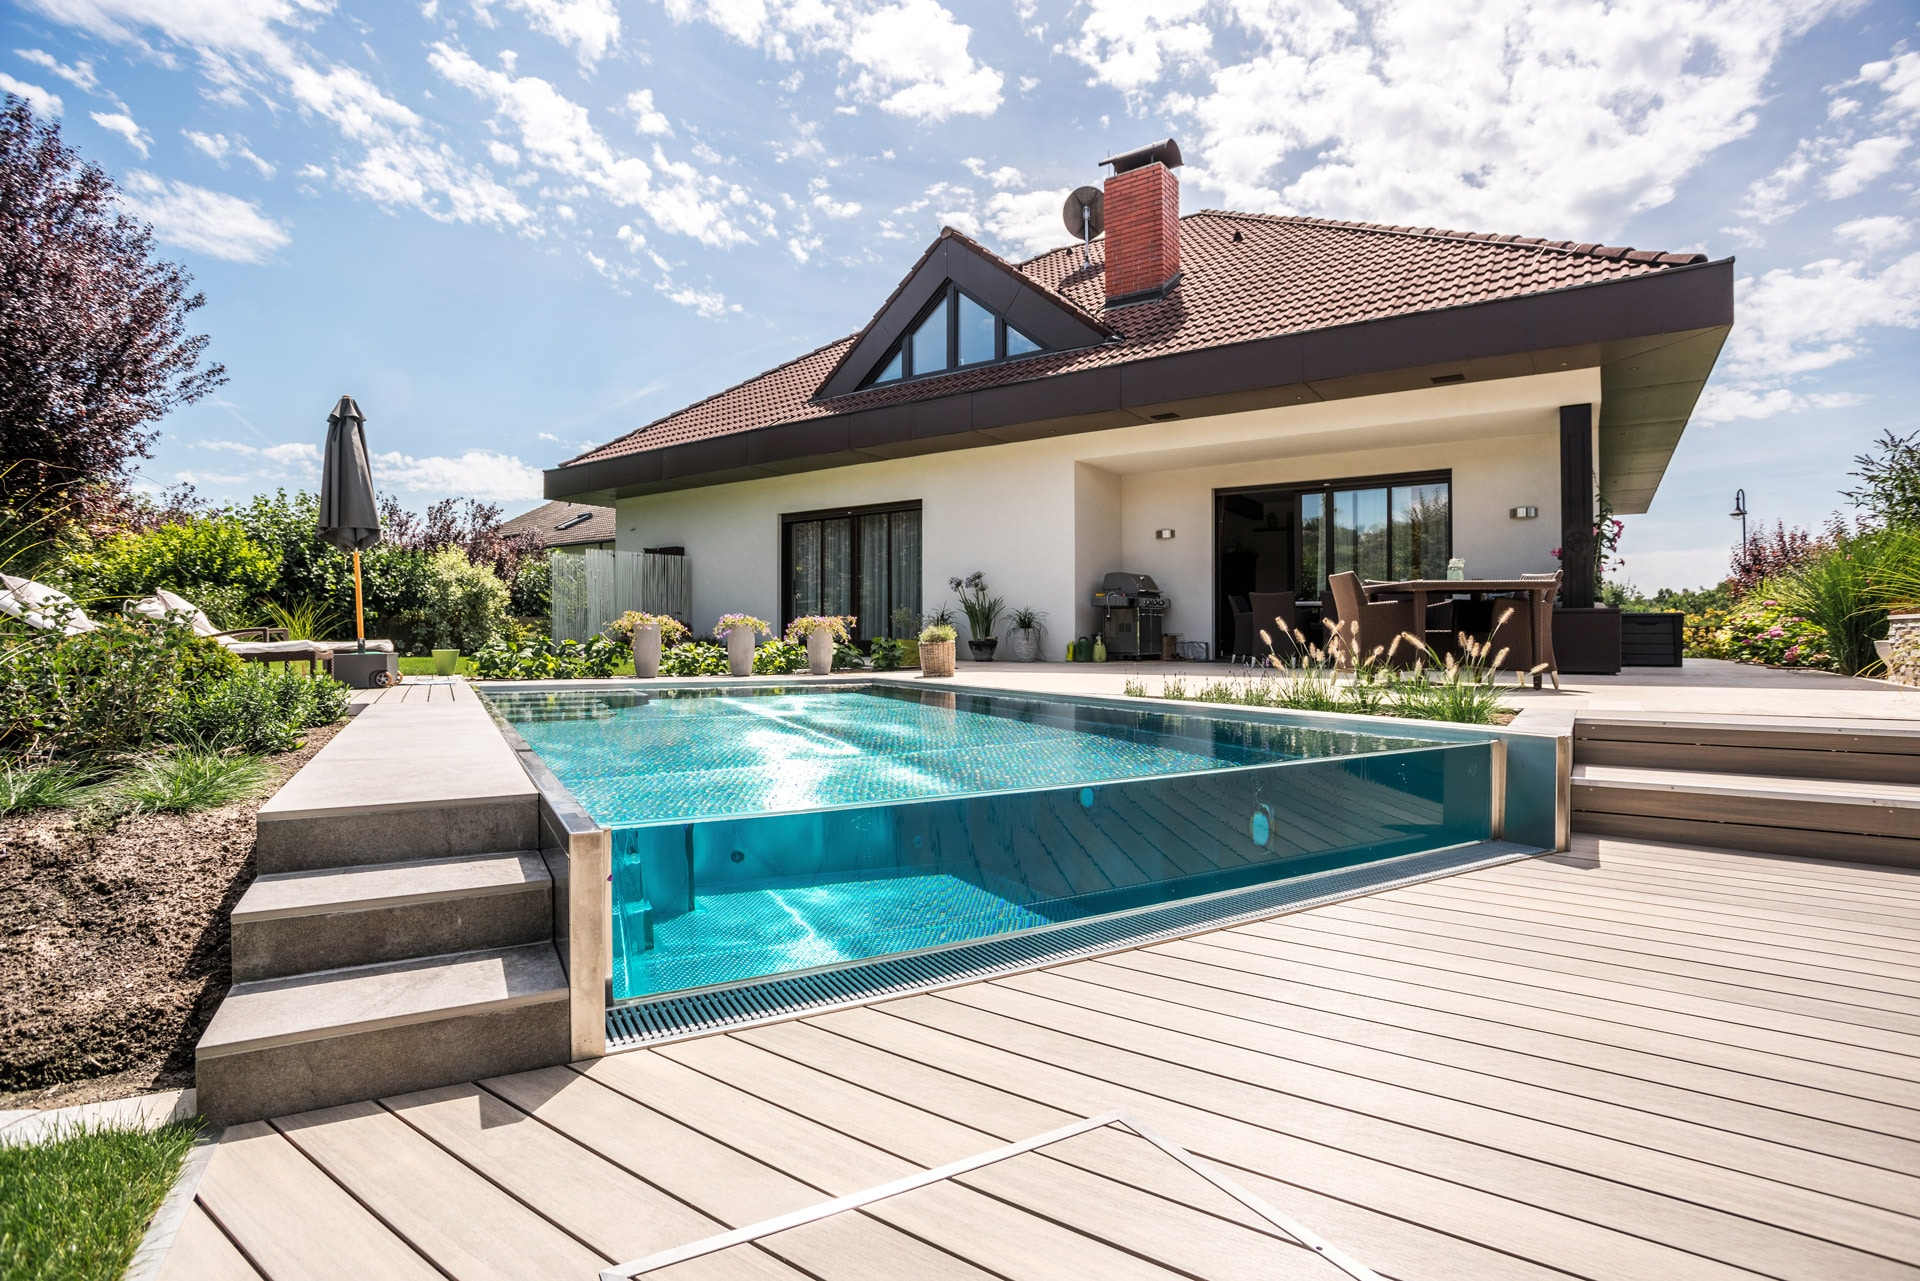 Überlaufpool 02 g | Edelstahlpool mit Glas-Überlauf Infinity bei Bungalow-Haus | Svoboda